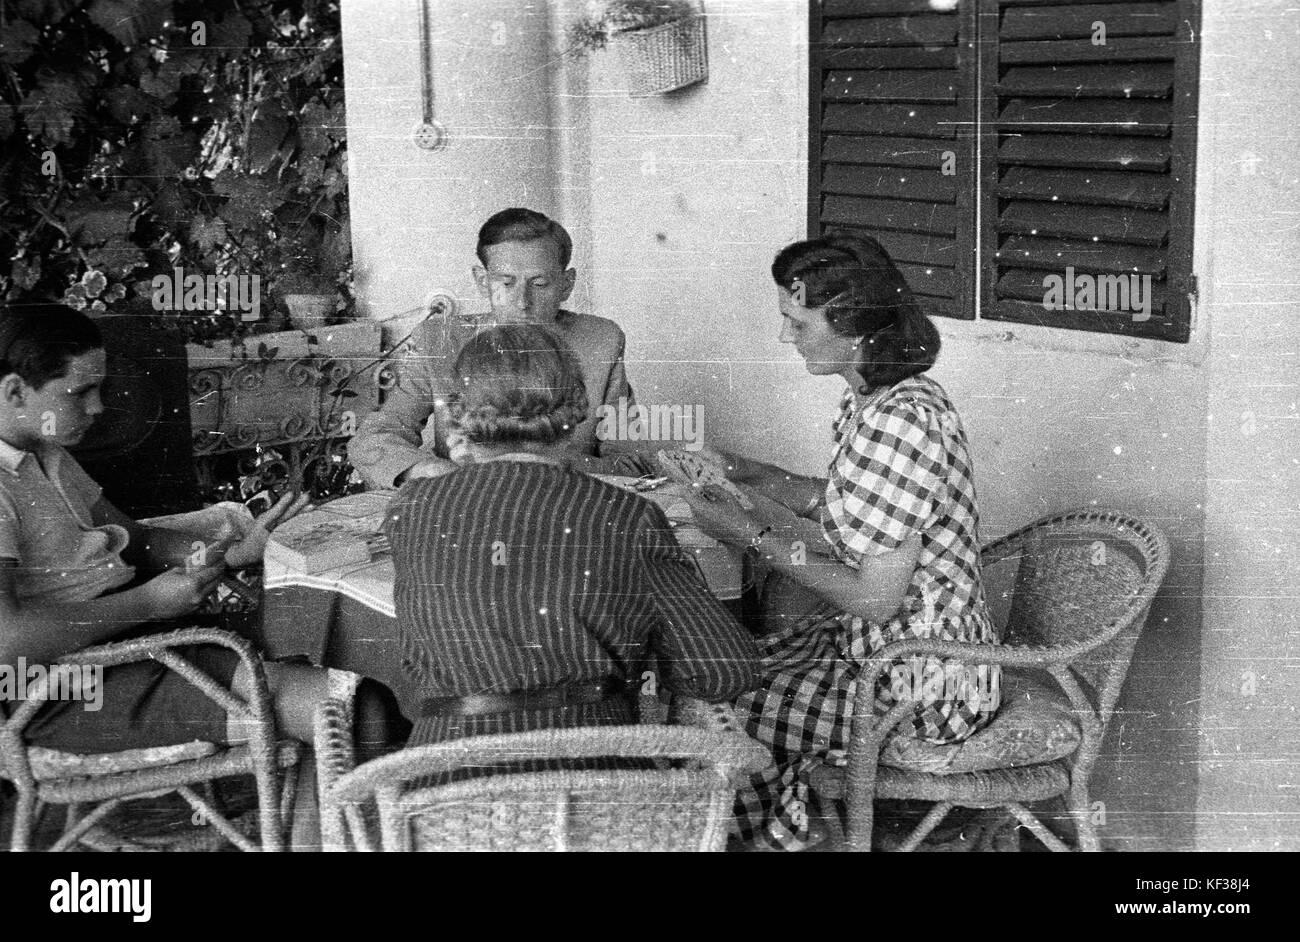 Terrace Companionship Card Game Wicker Chair Venetian Blind